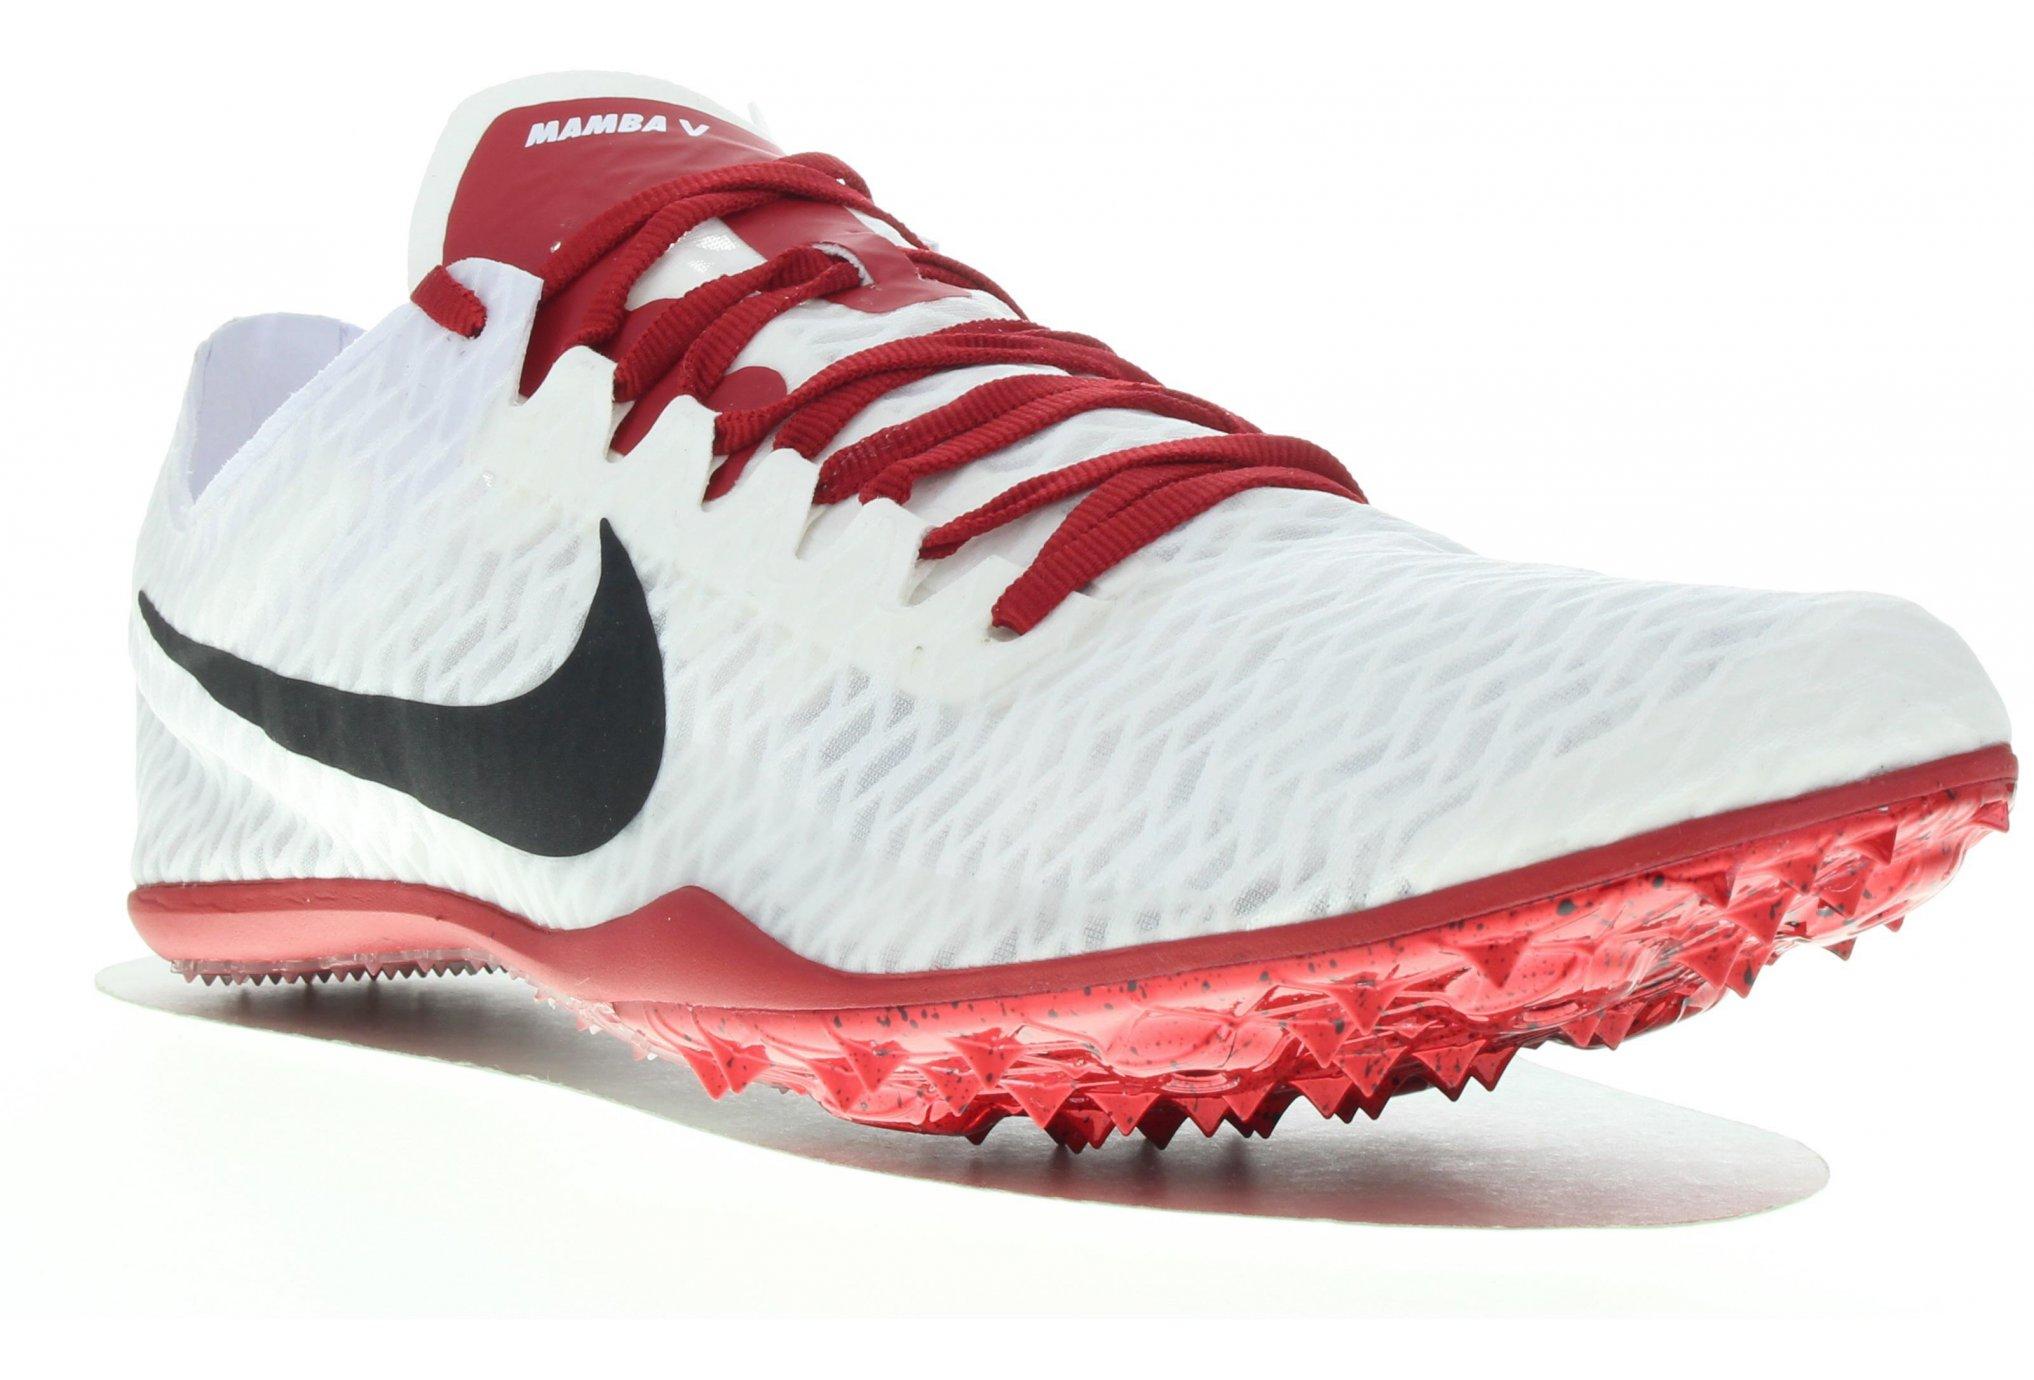 Nike Zoom Mamba 5 Bowerman Track Club M Diététique Chaussures homme